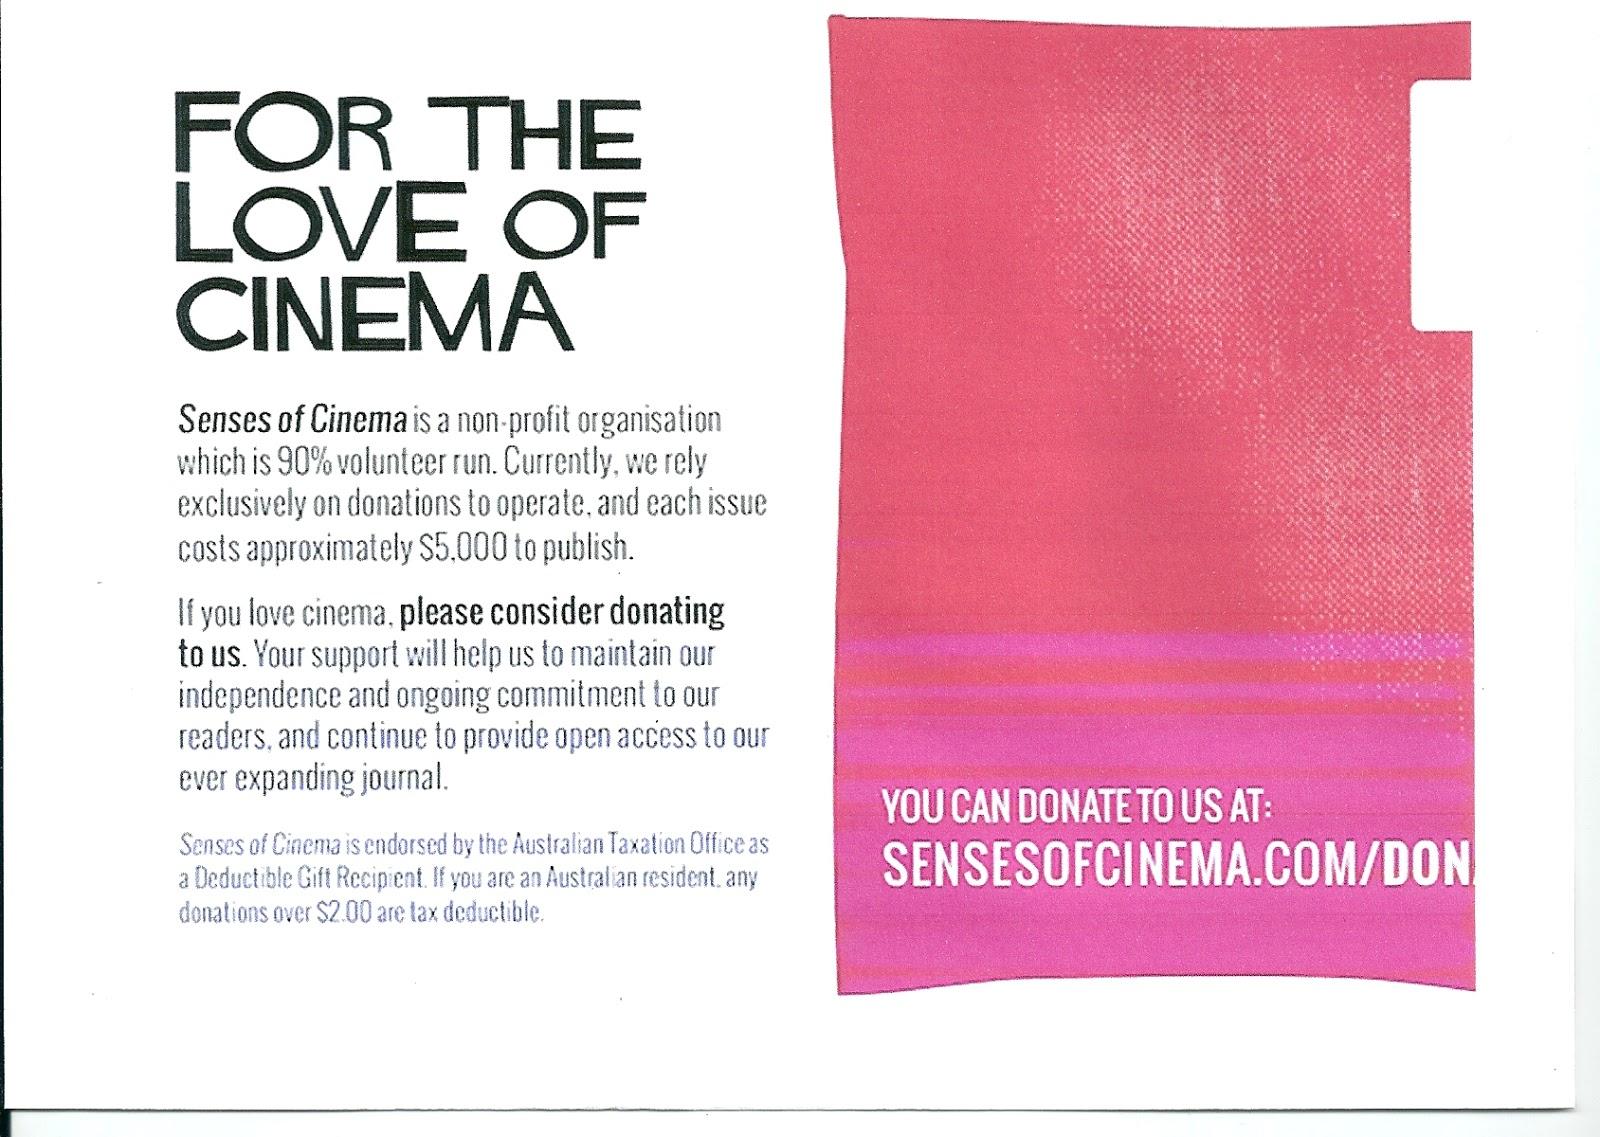 Film Alert 101: Senses of Cinema - Annual Appeal for Funds